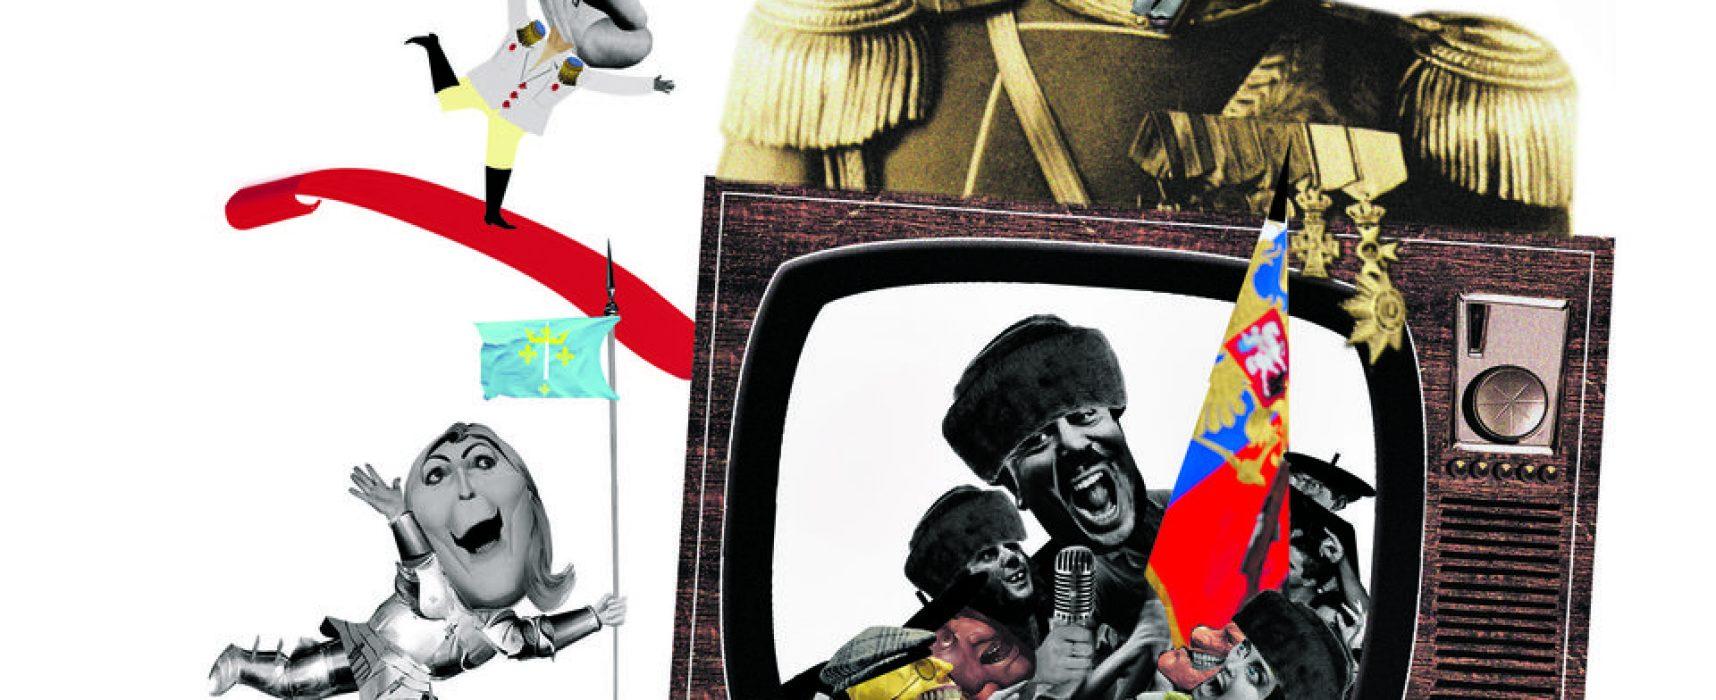 Russia Today : allo Paris, ici Moscou